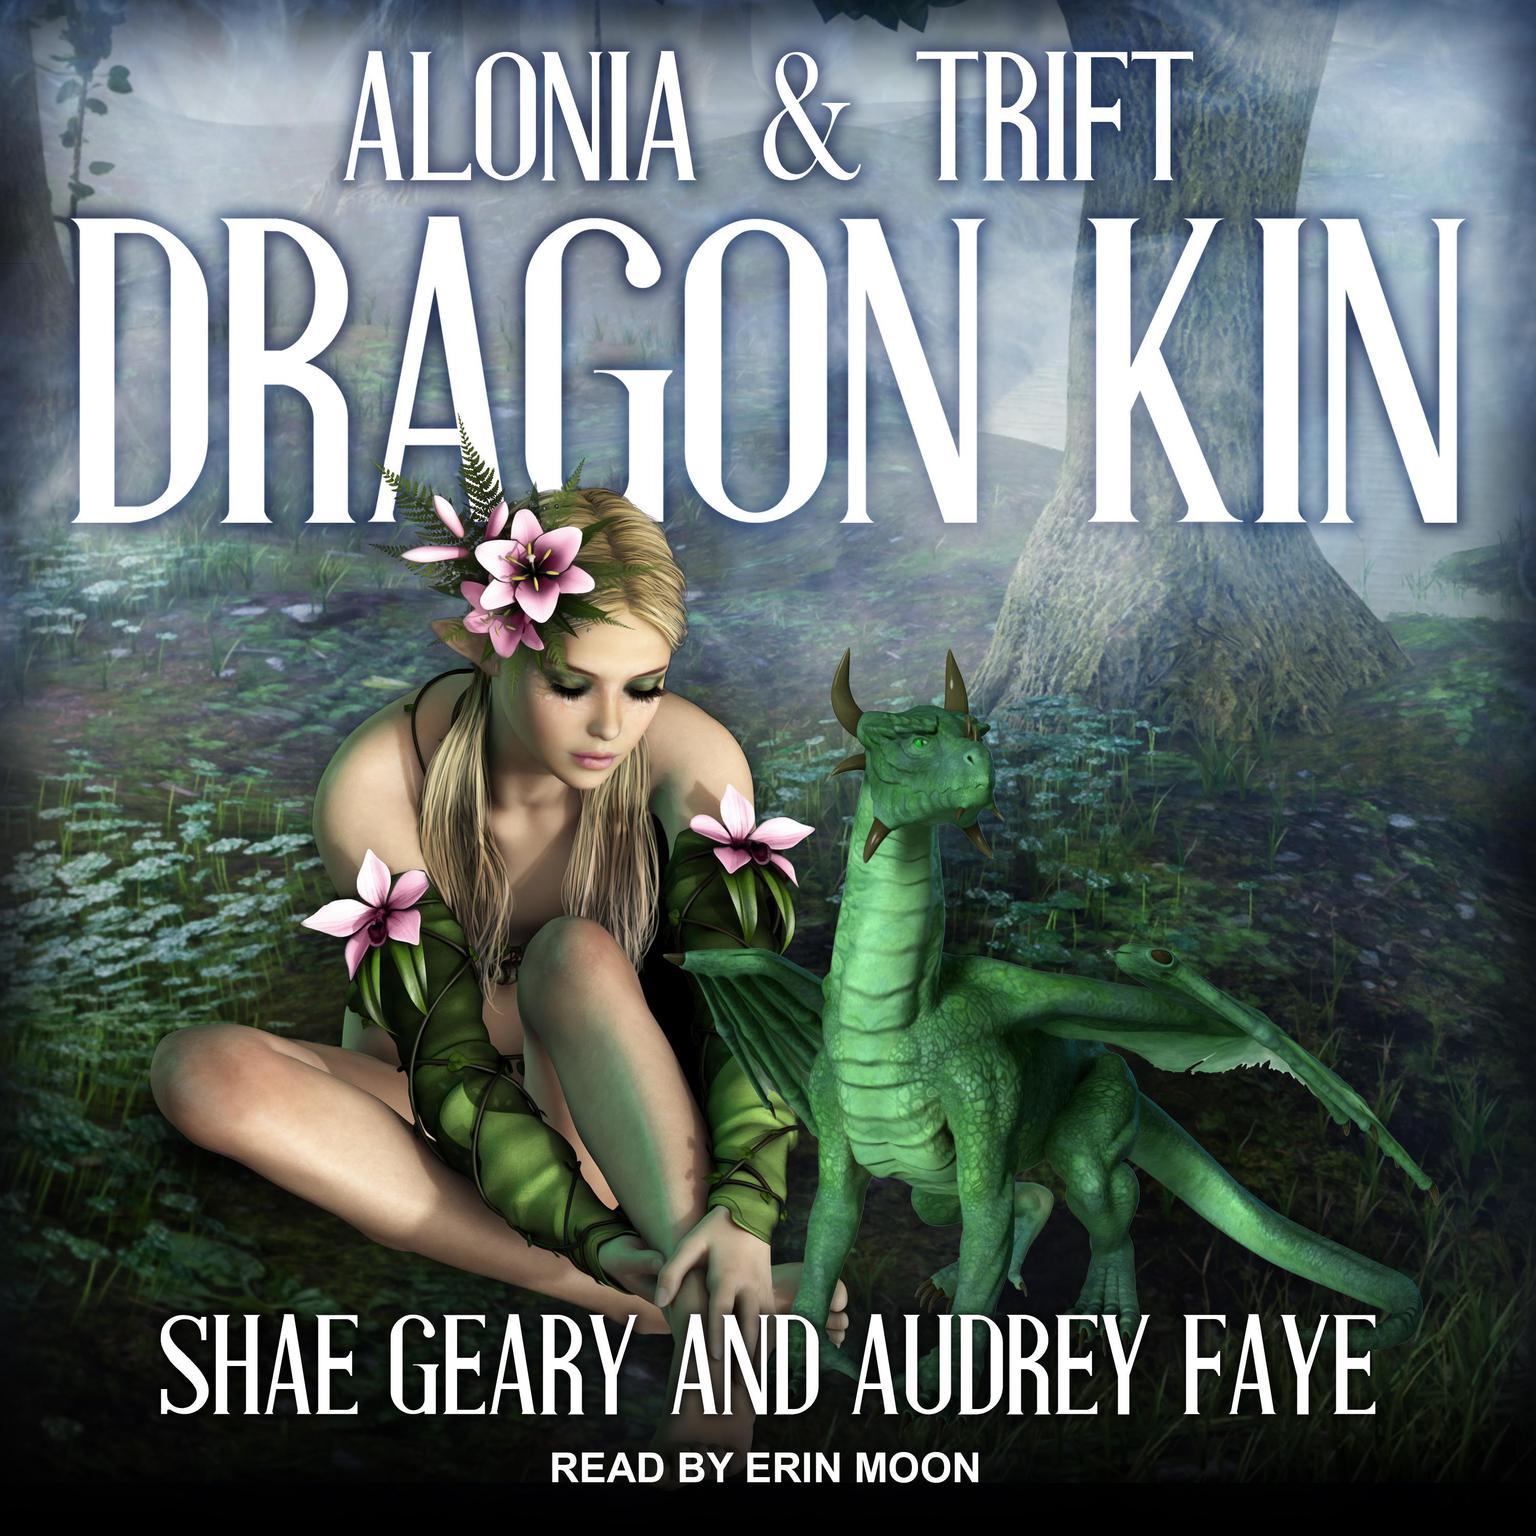 Printable Dragon Kin: Alonia & Trift Audiobook Cover Art